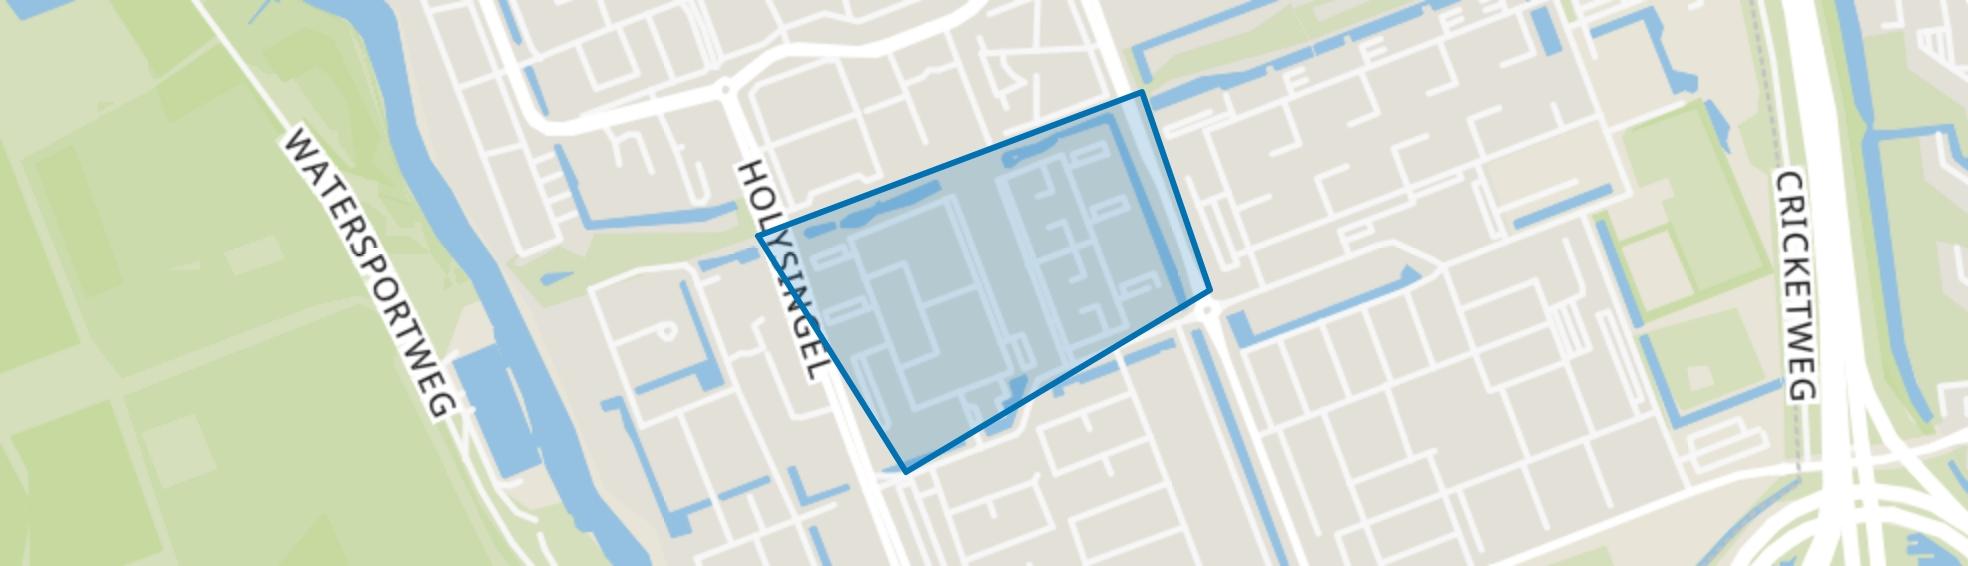 Loper Zuid, Vlaardingen map